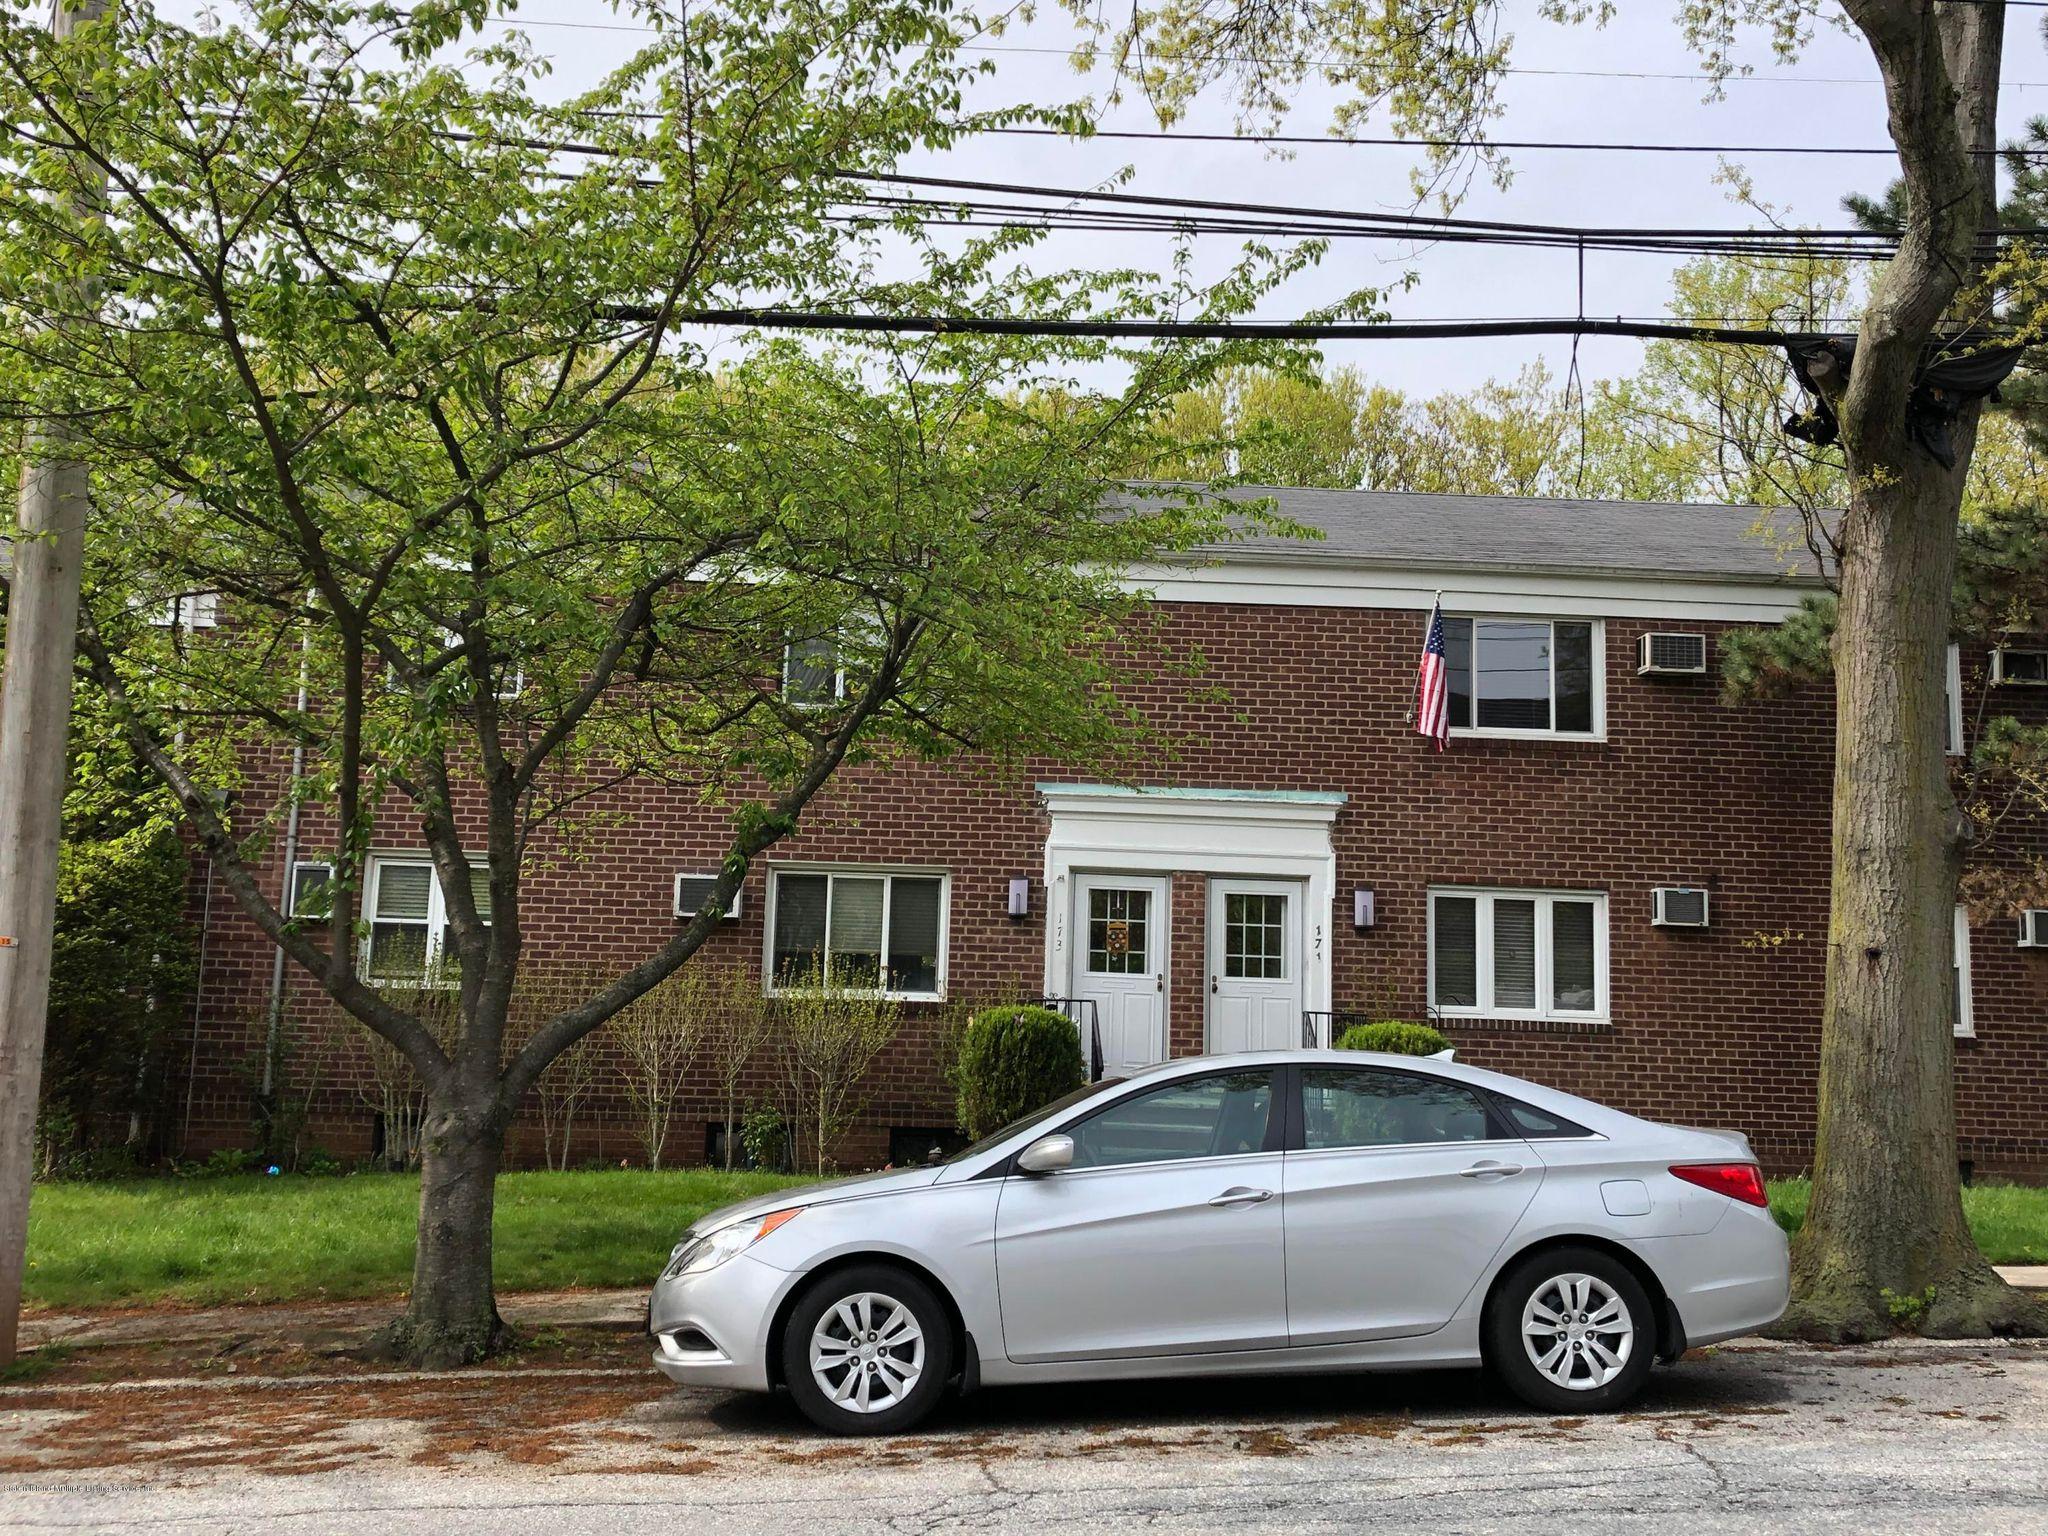 173 Arlo Rd B Staten Island Ny 10301 2 Bed 1 Bath Coop Mls